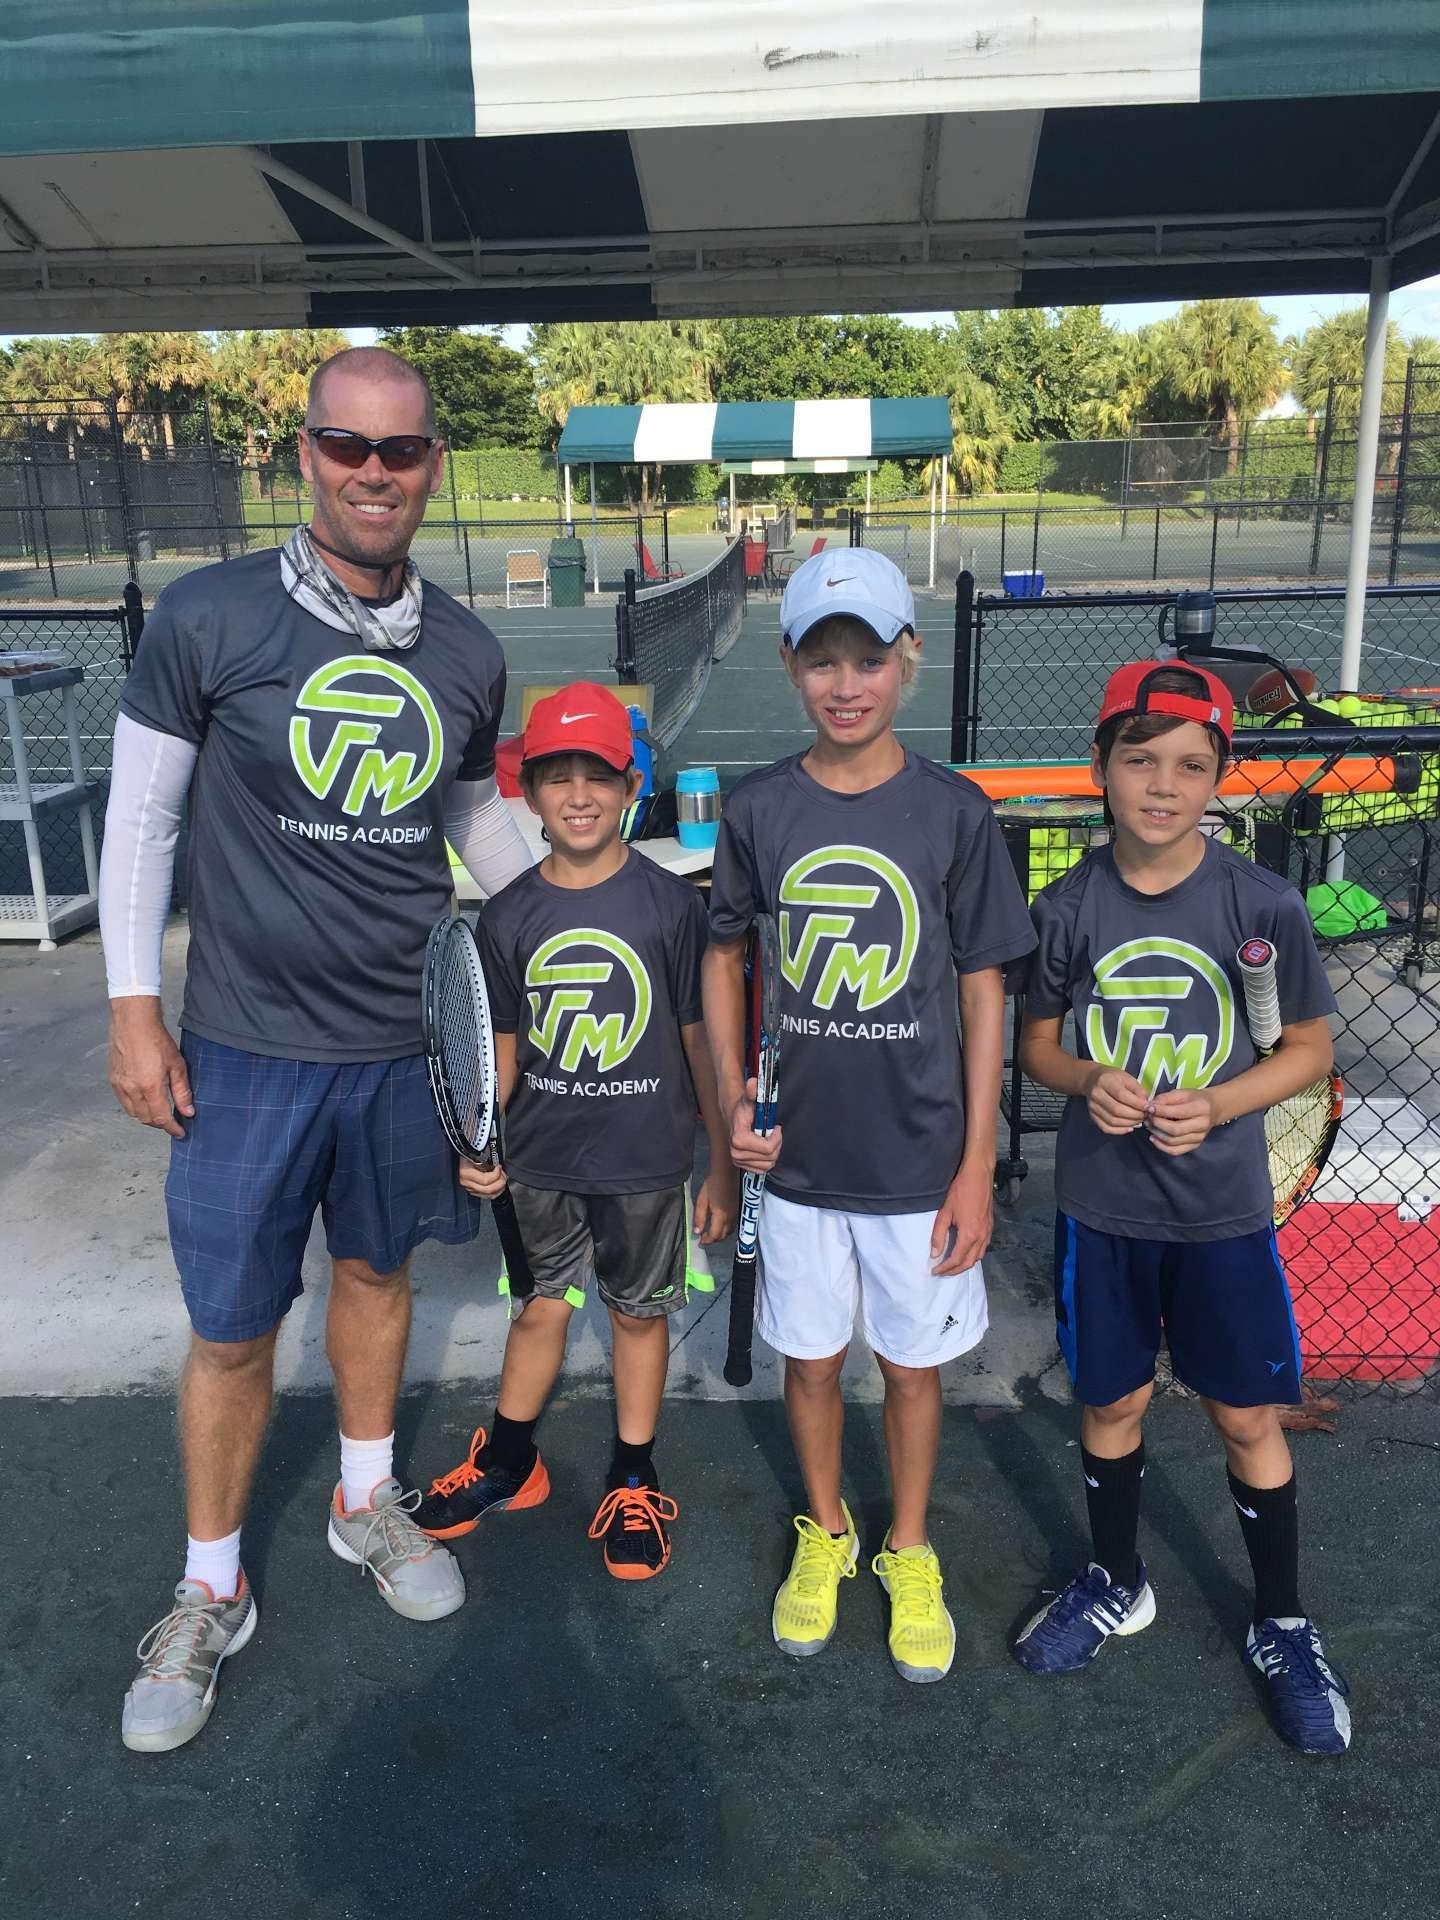 Allington Mutimer with three junior tennis player